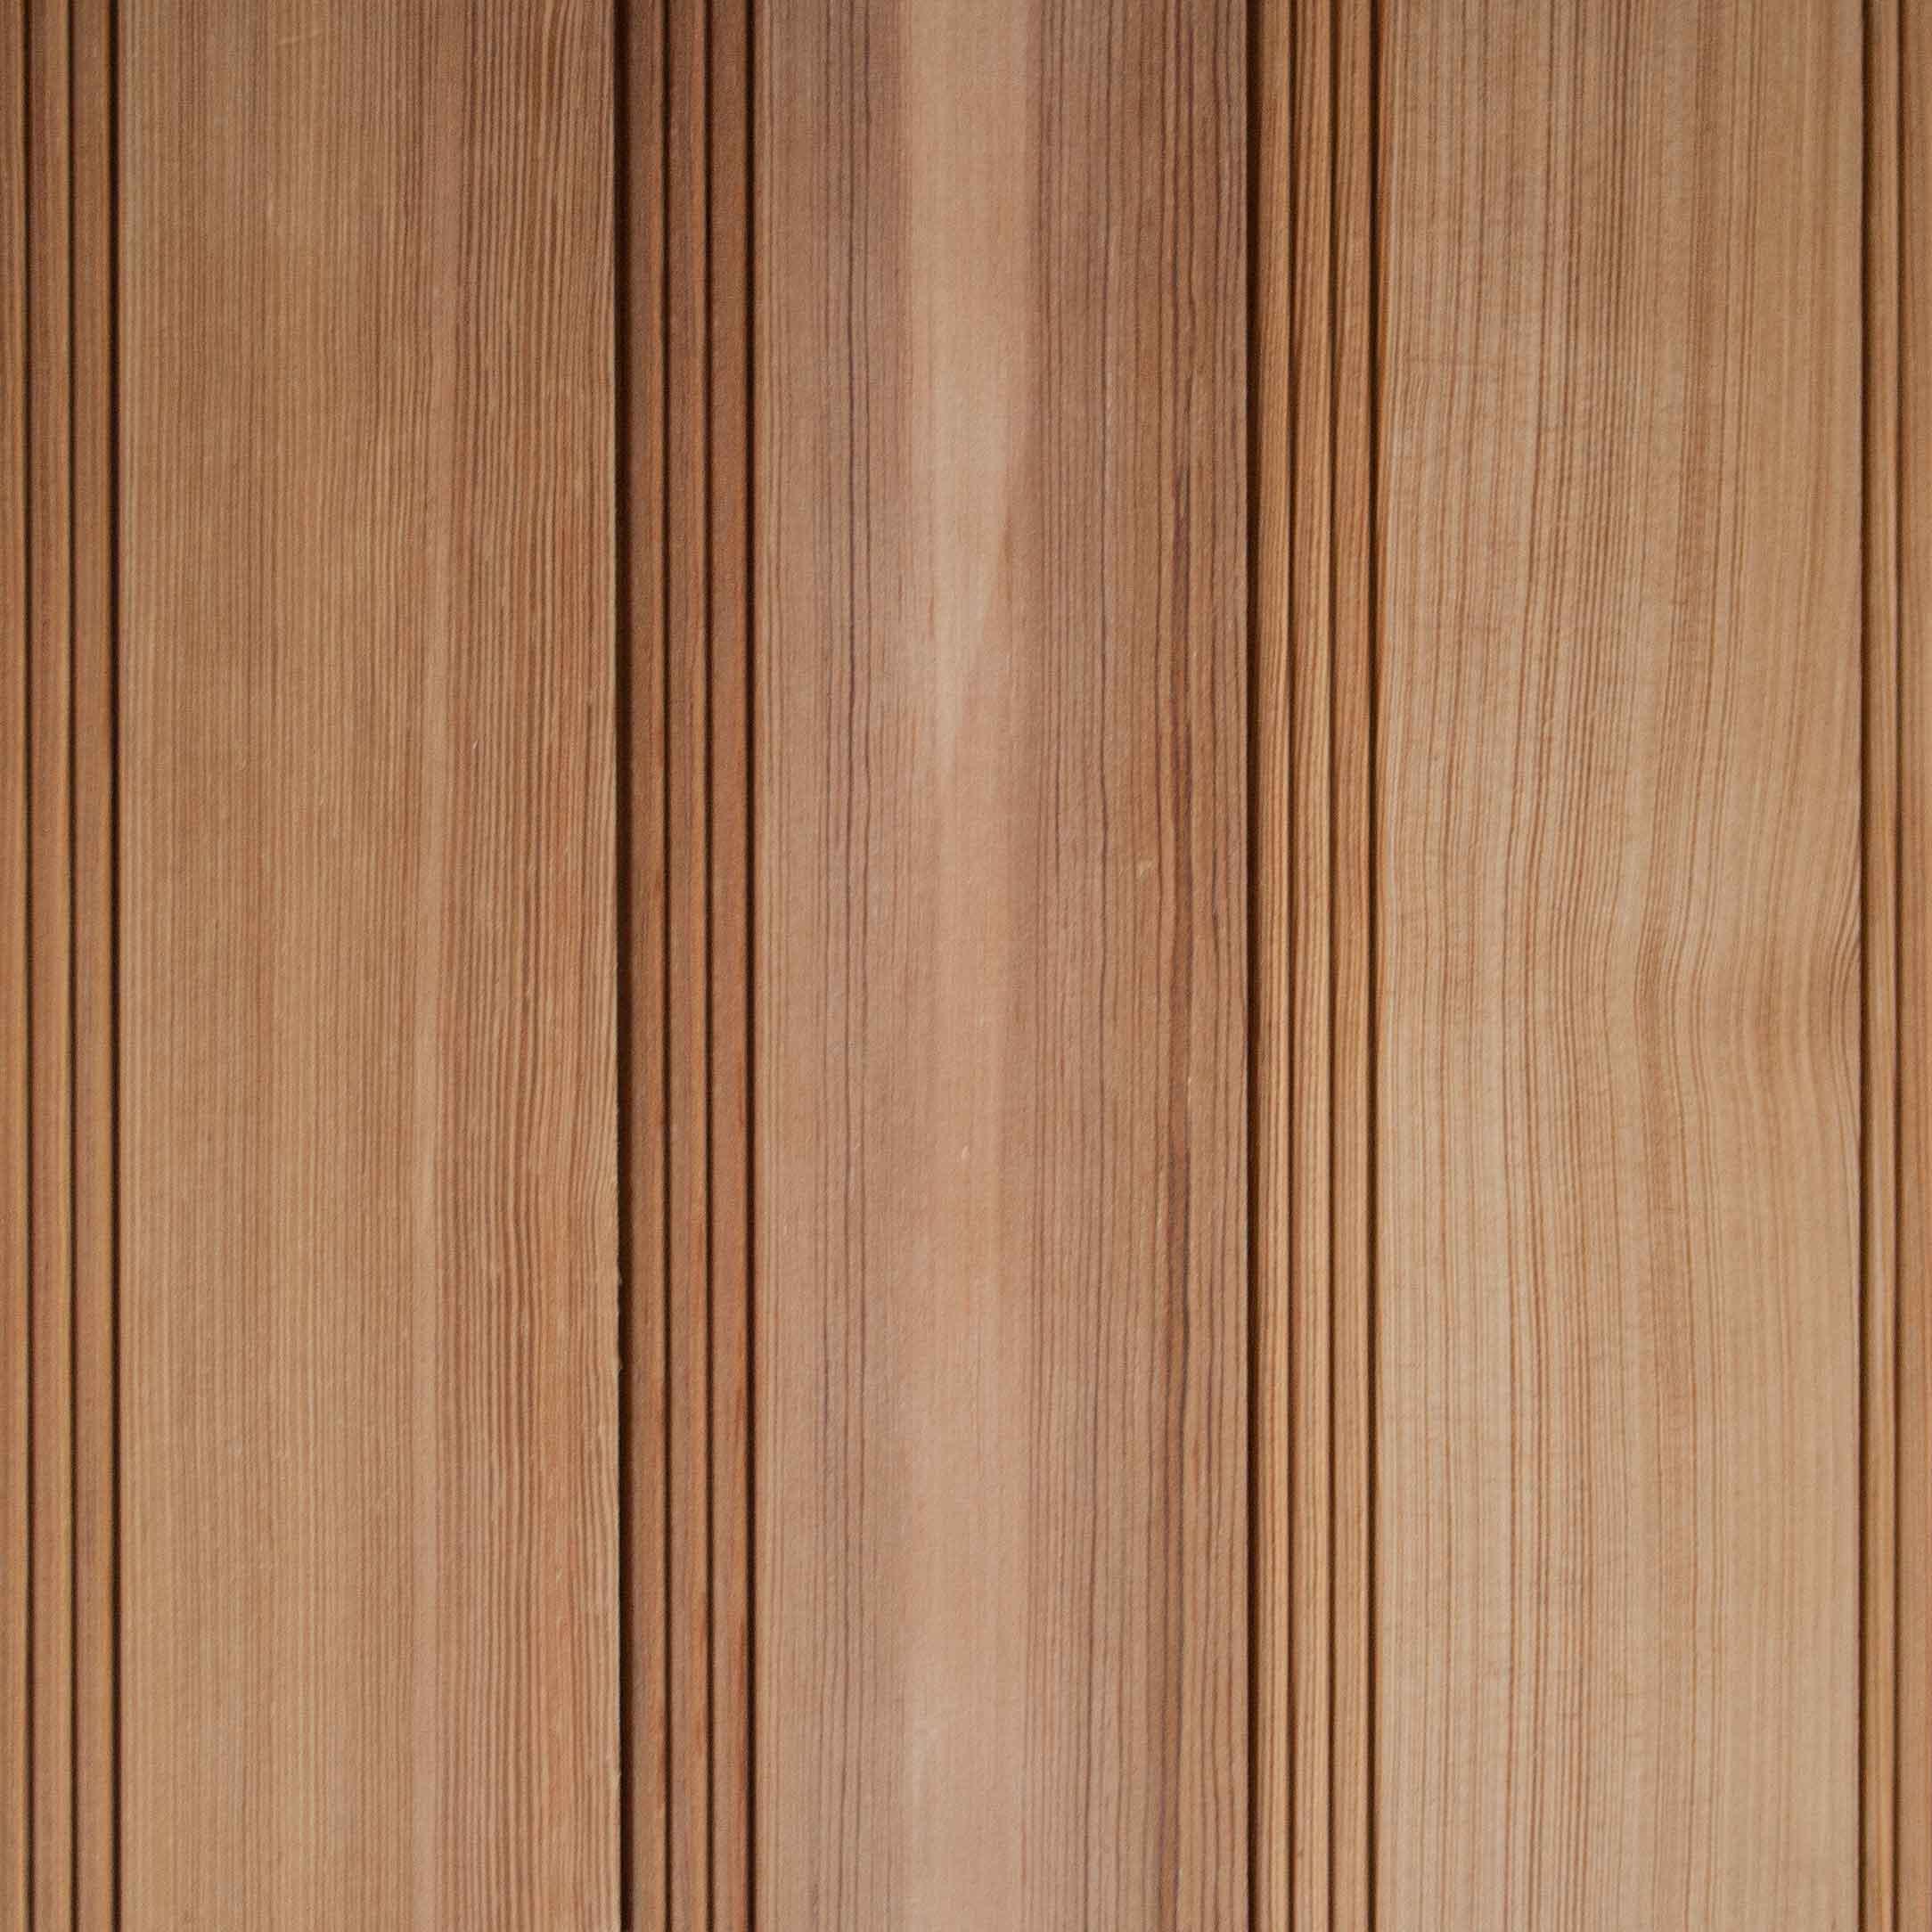 Wood Plank Paneling ~ Longleaf lumber bright planed heart pine paneling